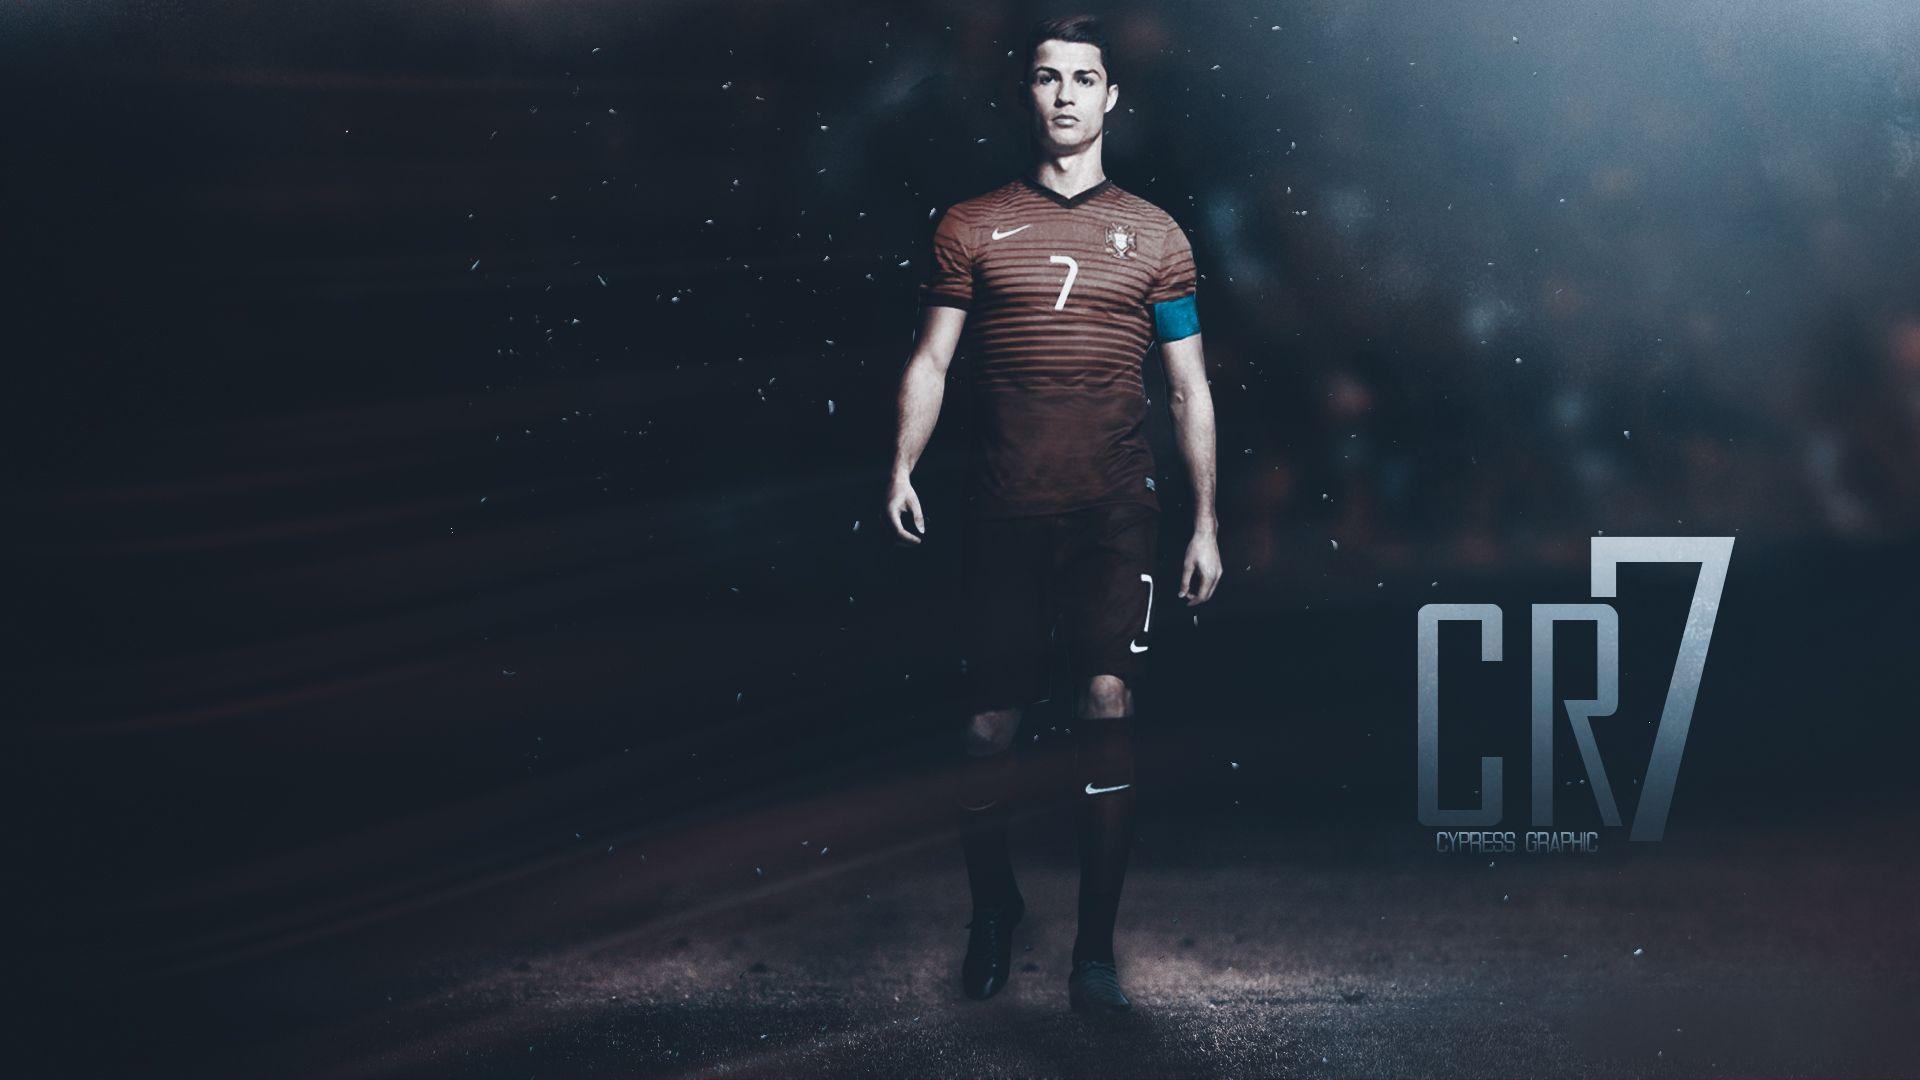 Cristiano Ronaldo Wallpapers | FootballStars.Info